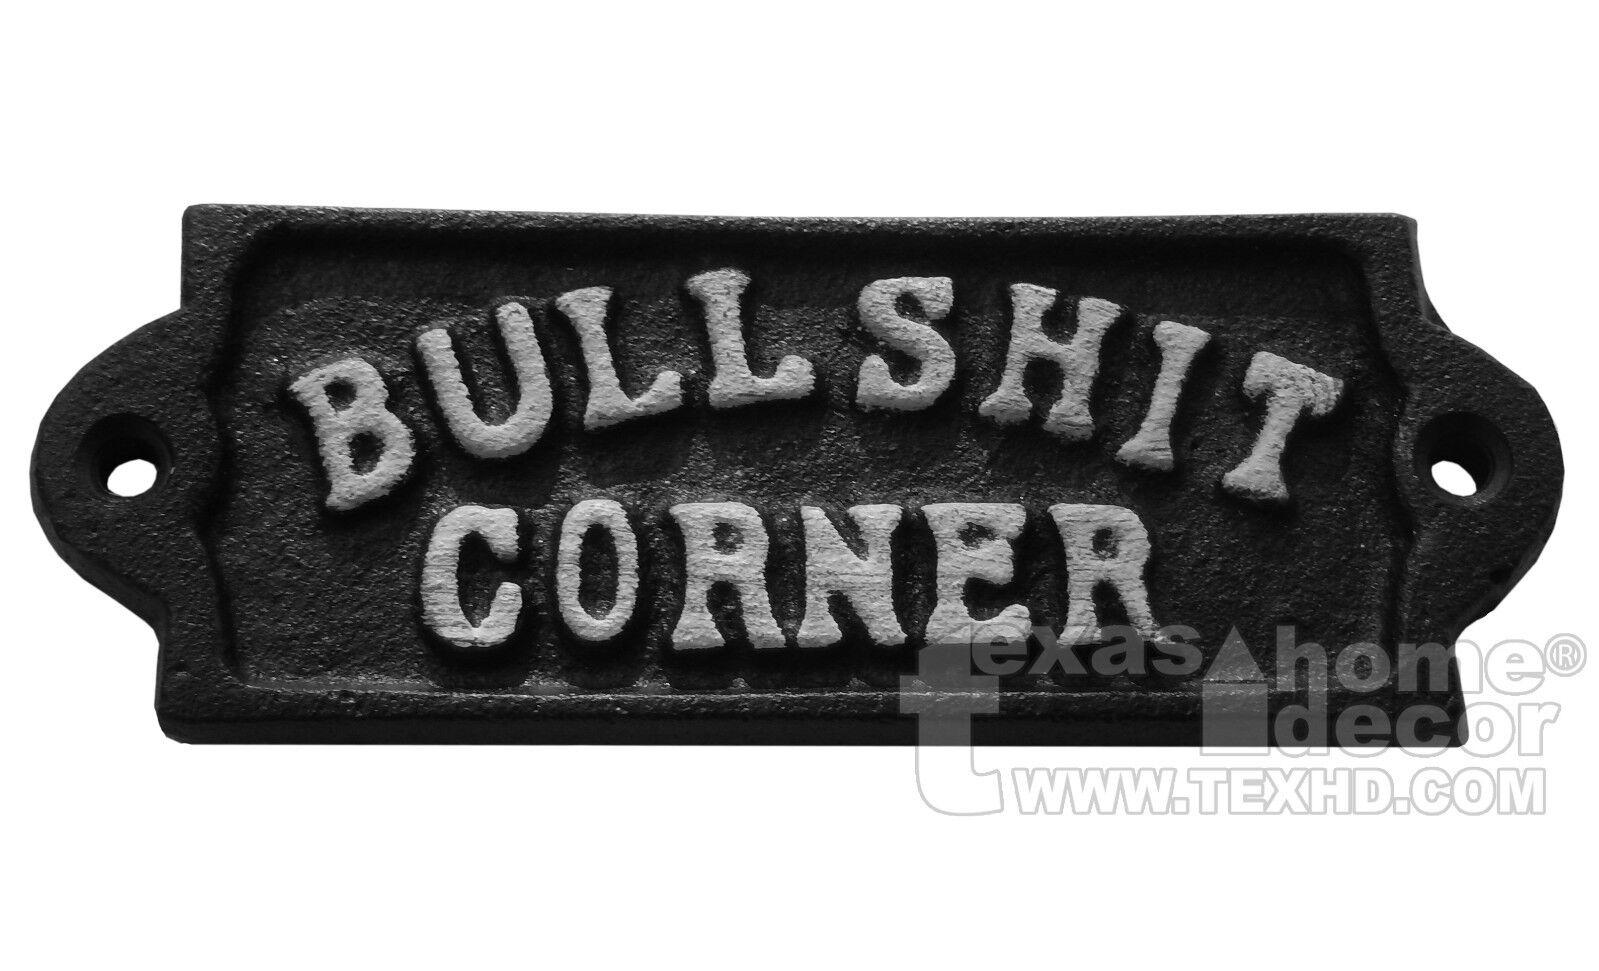 BULLSHIT CORNER Sign Cast Iron Wall Plaque Country Man Cave